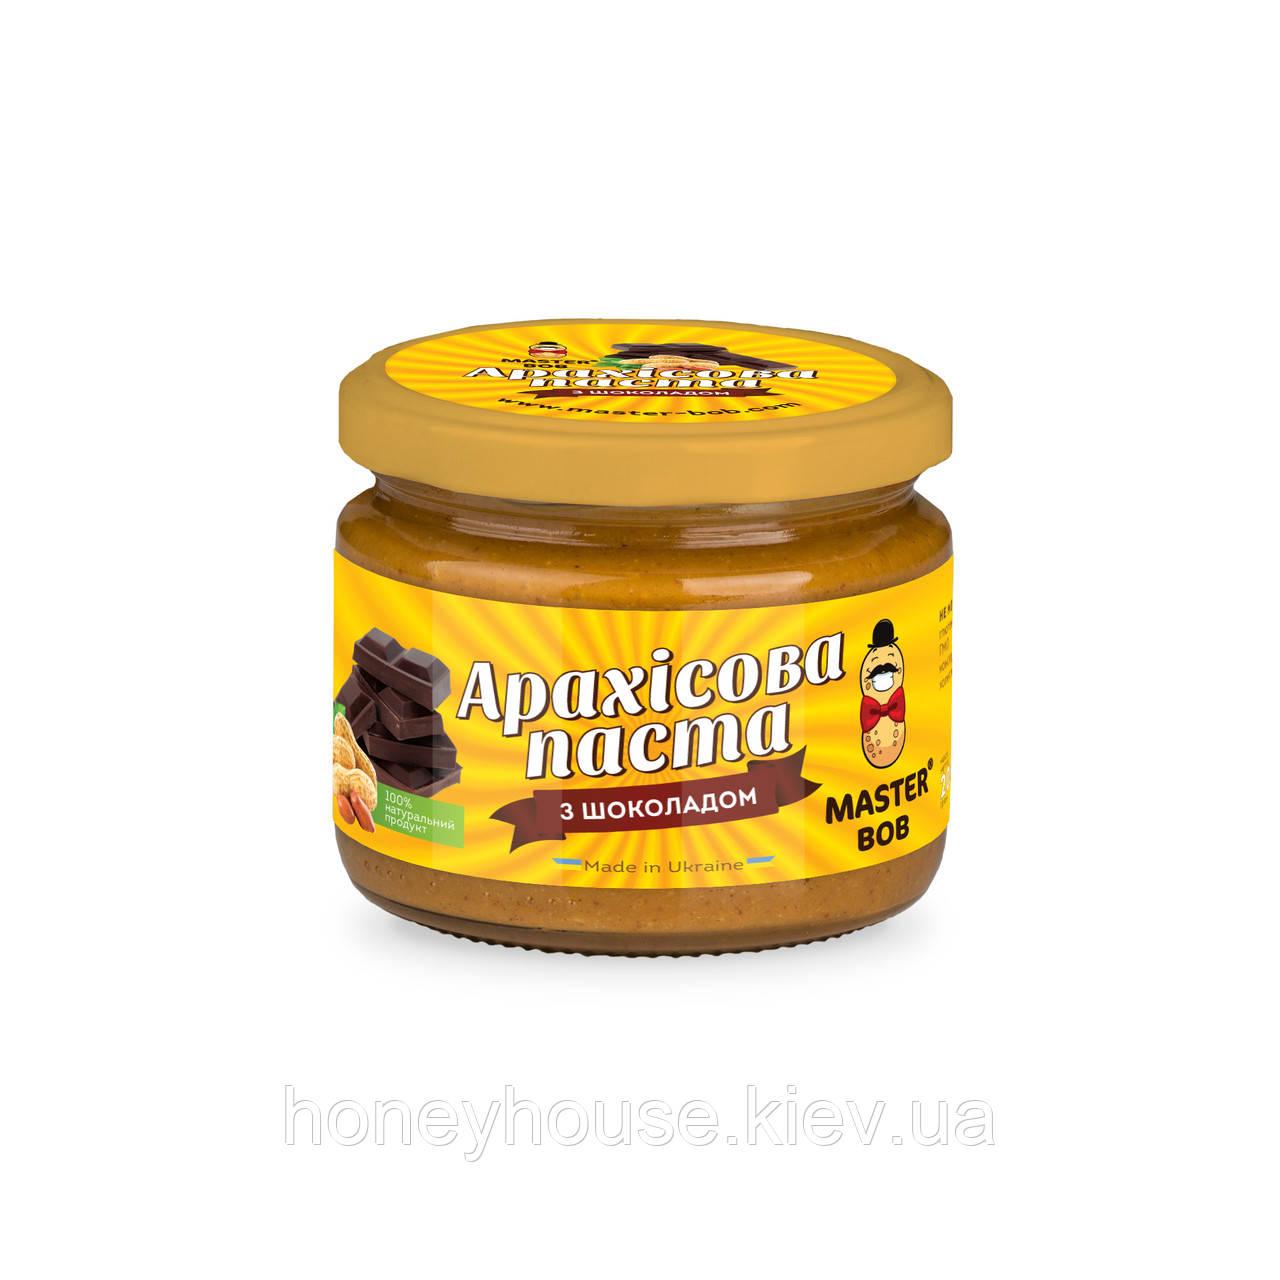 Паста арахисовая с шоколадом ТМ Мастер Боб, 200гр